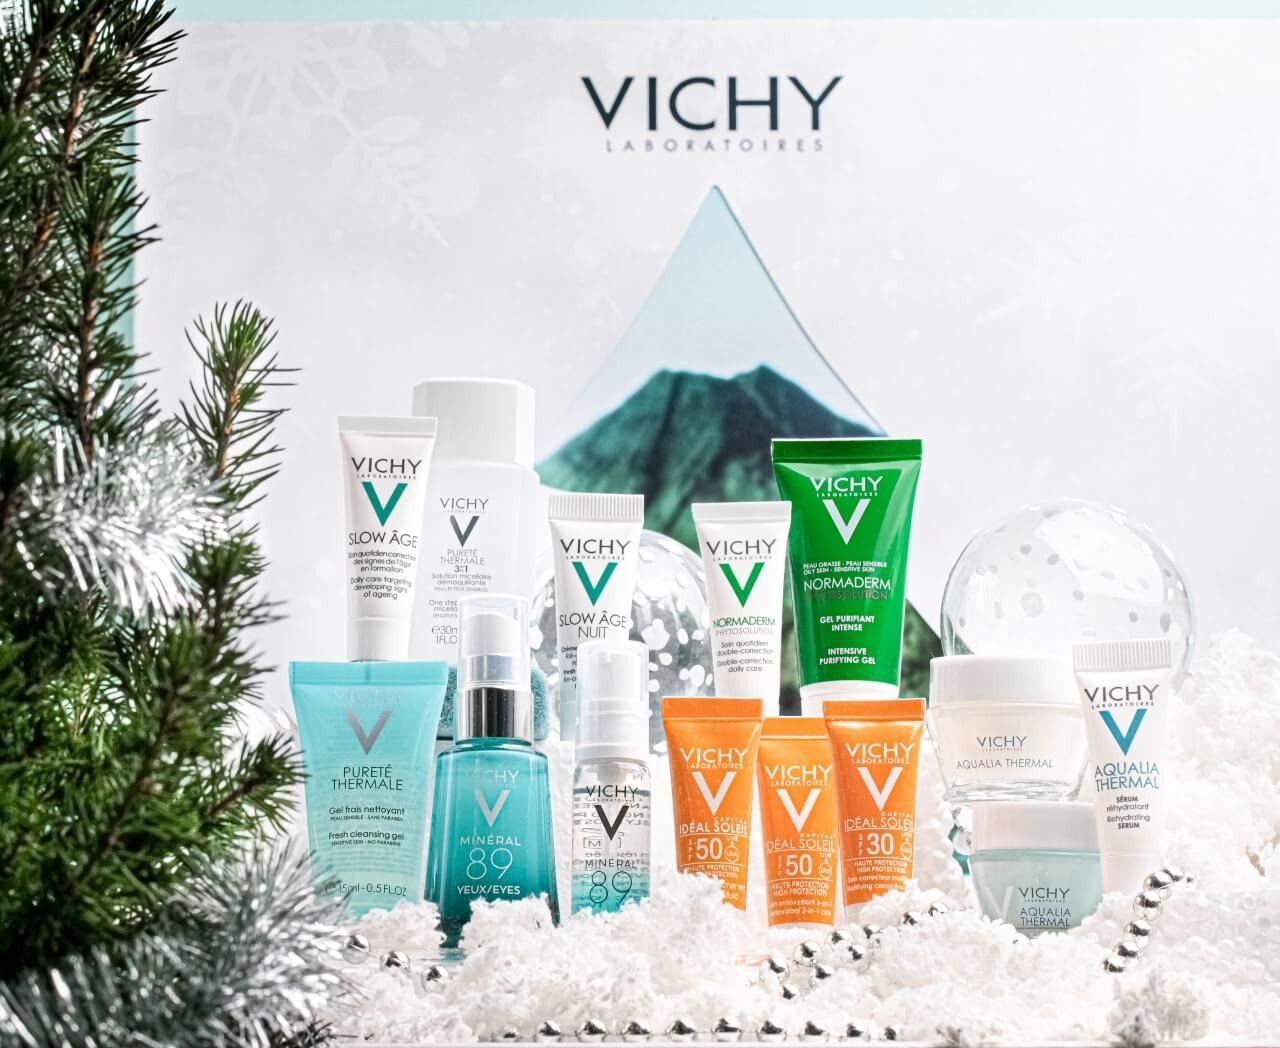 VICHY: Промокод на Покупку Новогодних Наборов!